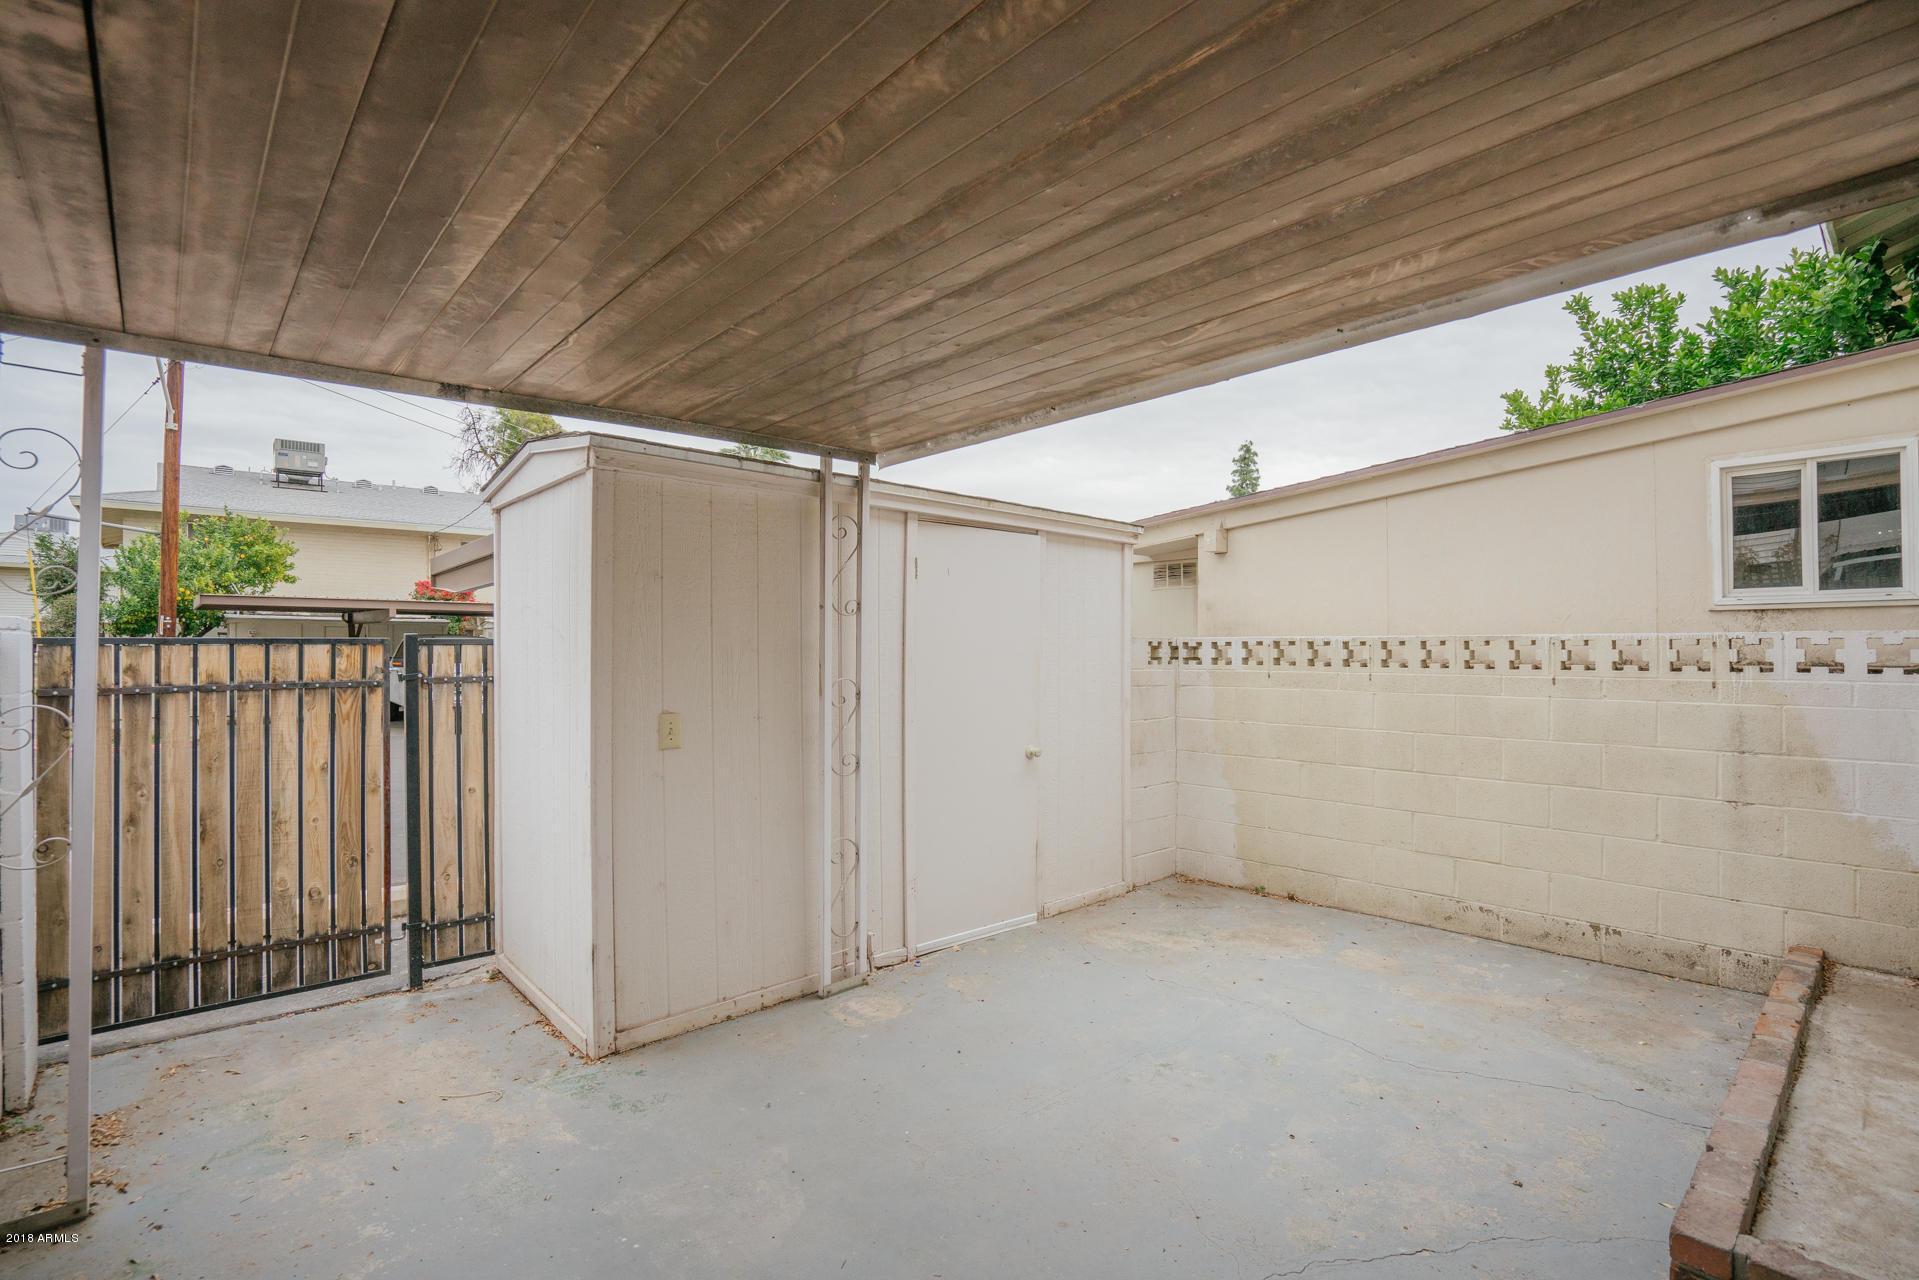 Glendale AZ 85301 Photo 15